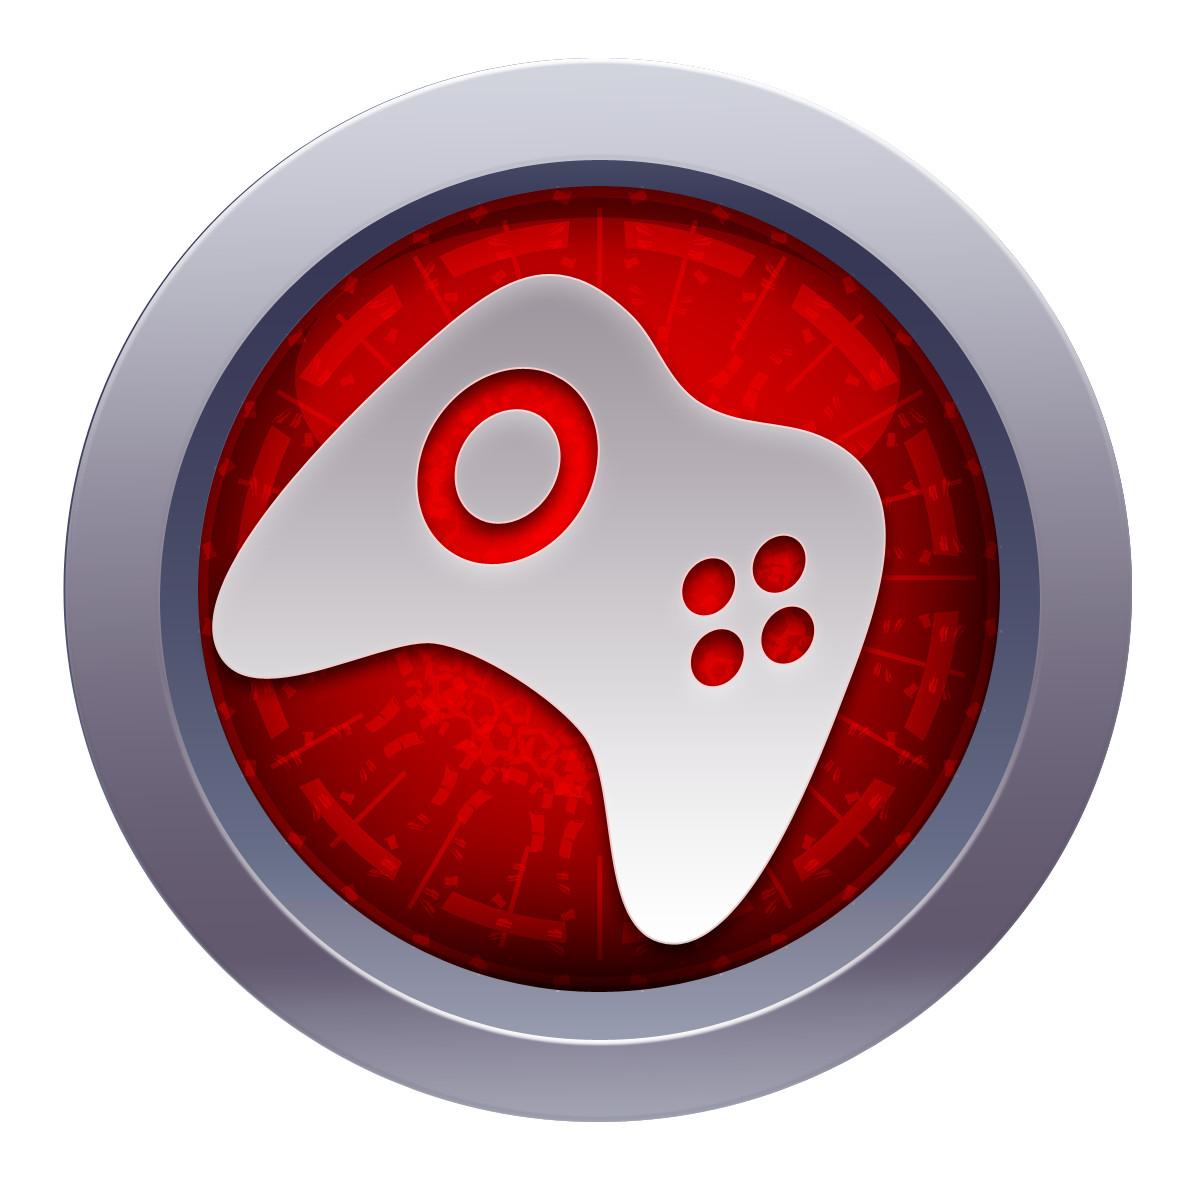 Game Icon By Xxpixelpicturesxx D 4 Image Tokemon Mod Db